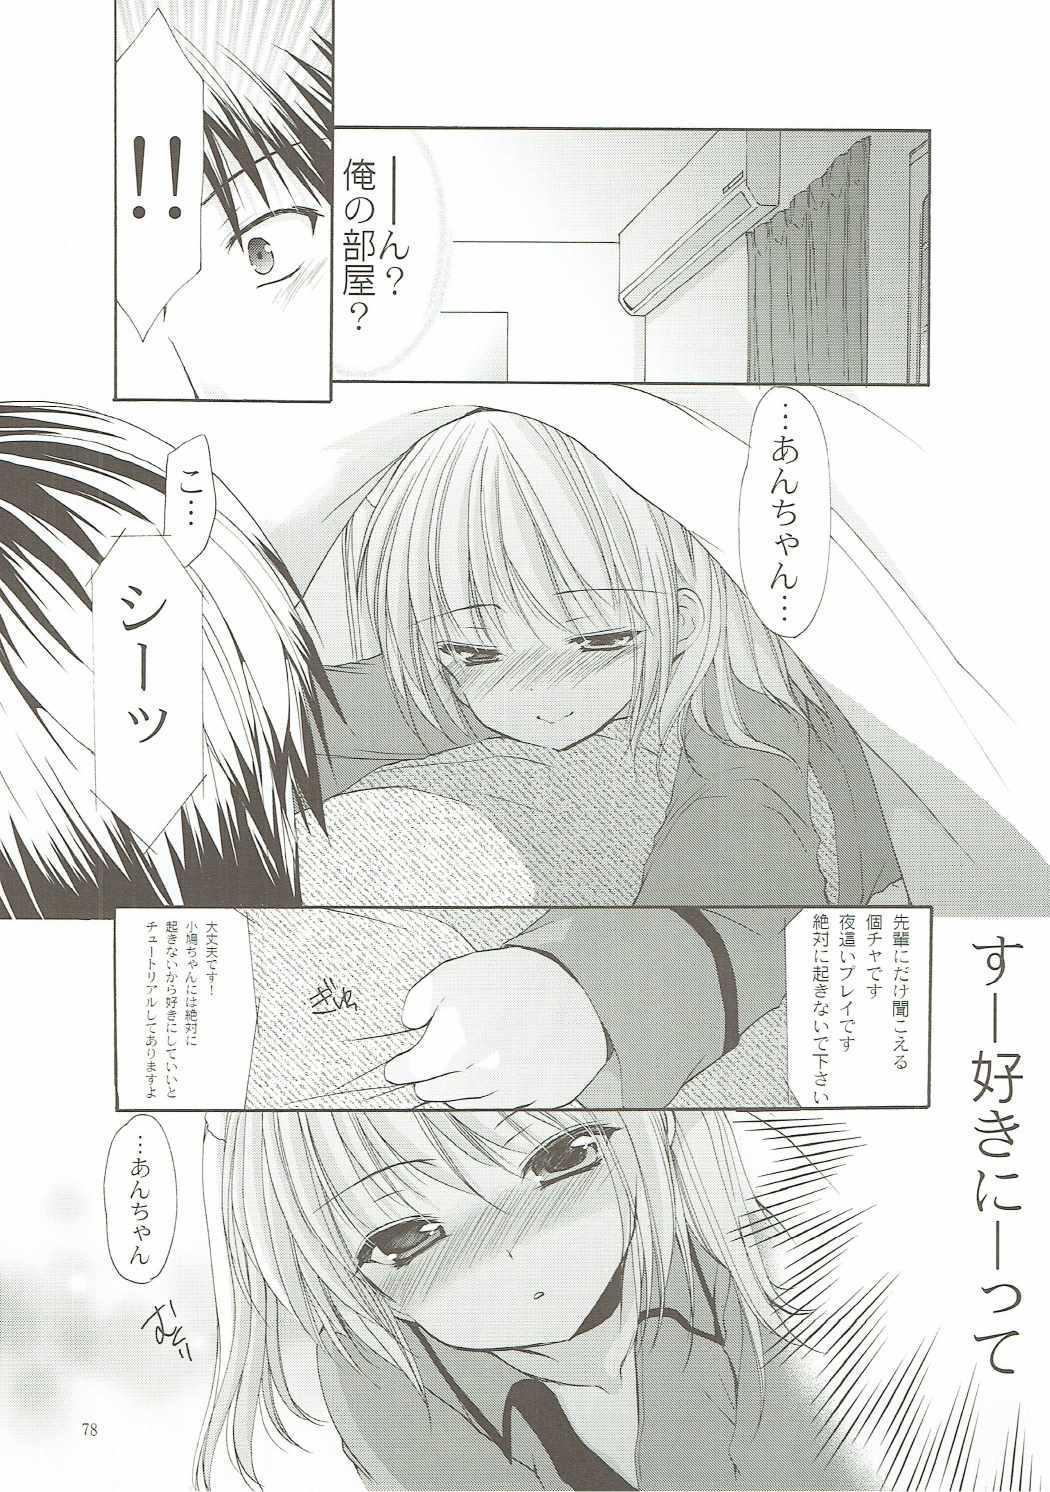 ANIME COLLECTION Imomuya Honpo - Singleton Anime Soushuuhen 76